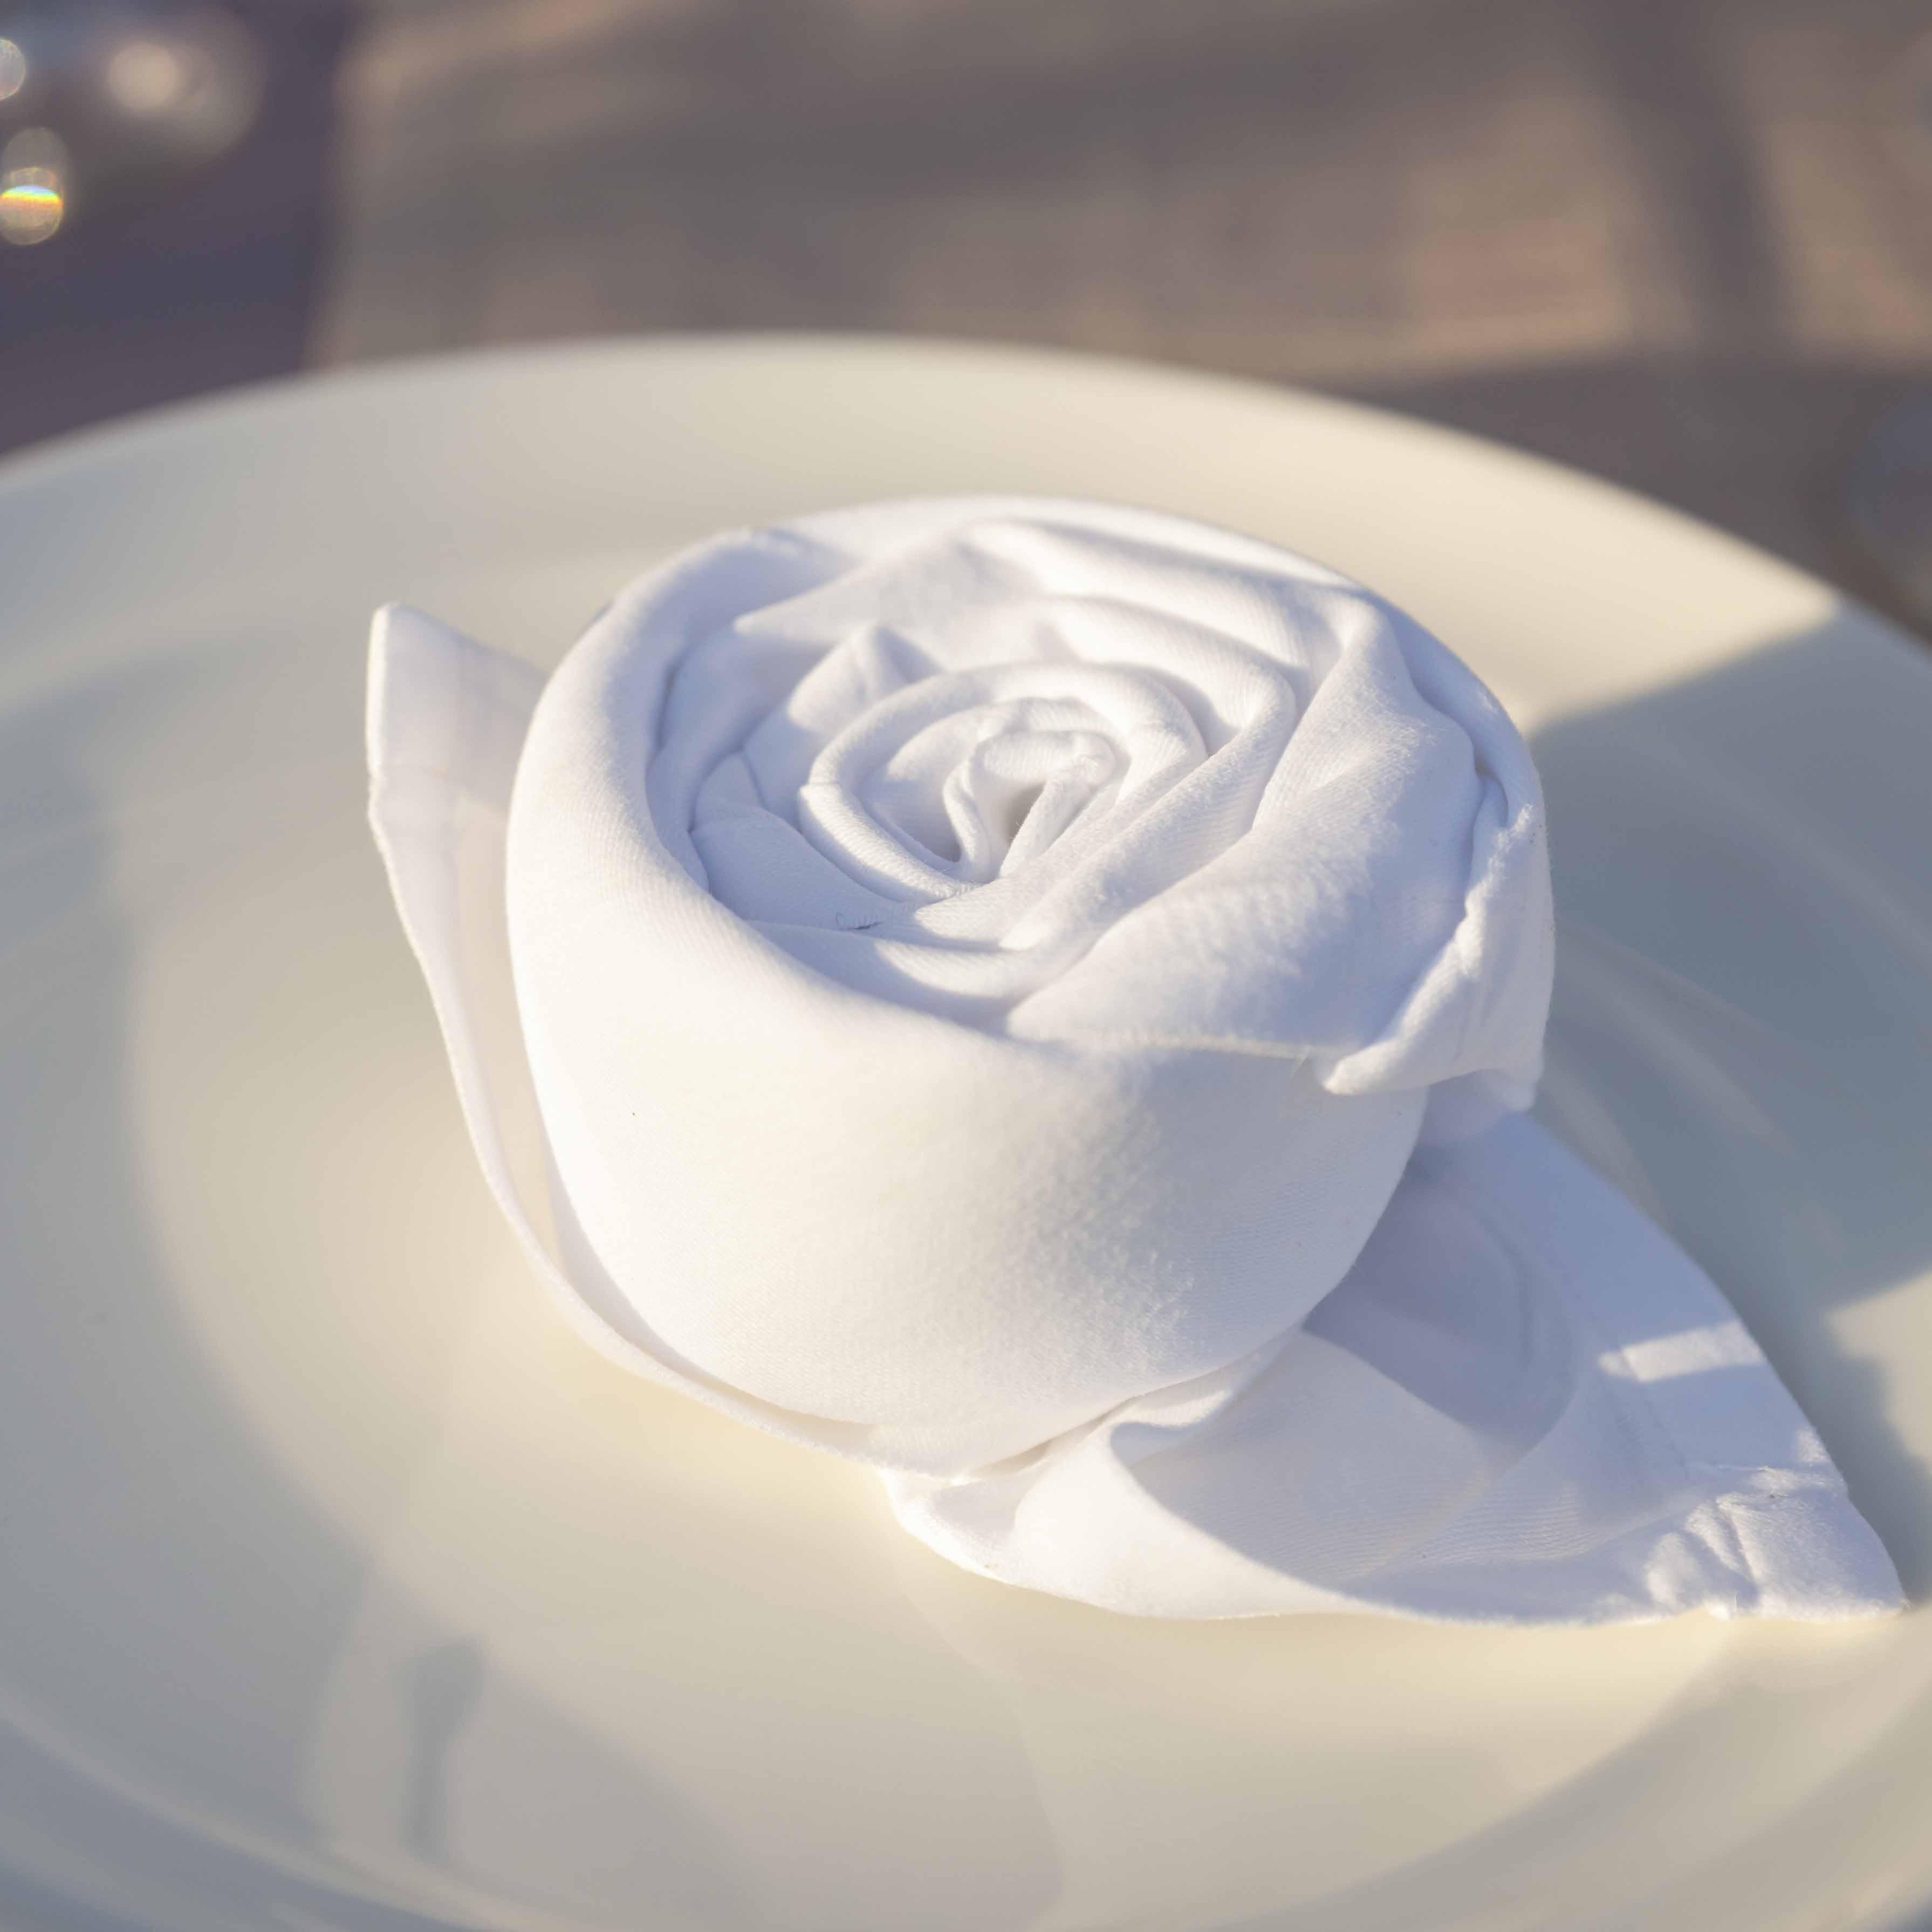 Fold Napkin Into Rose Folded Napkins Into Roses With Fold Napkin